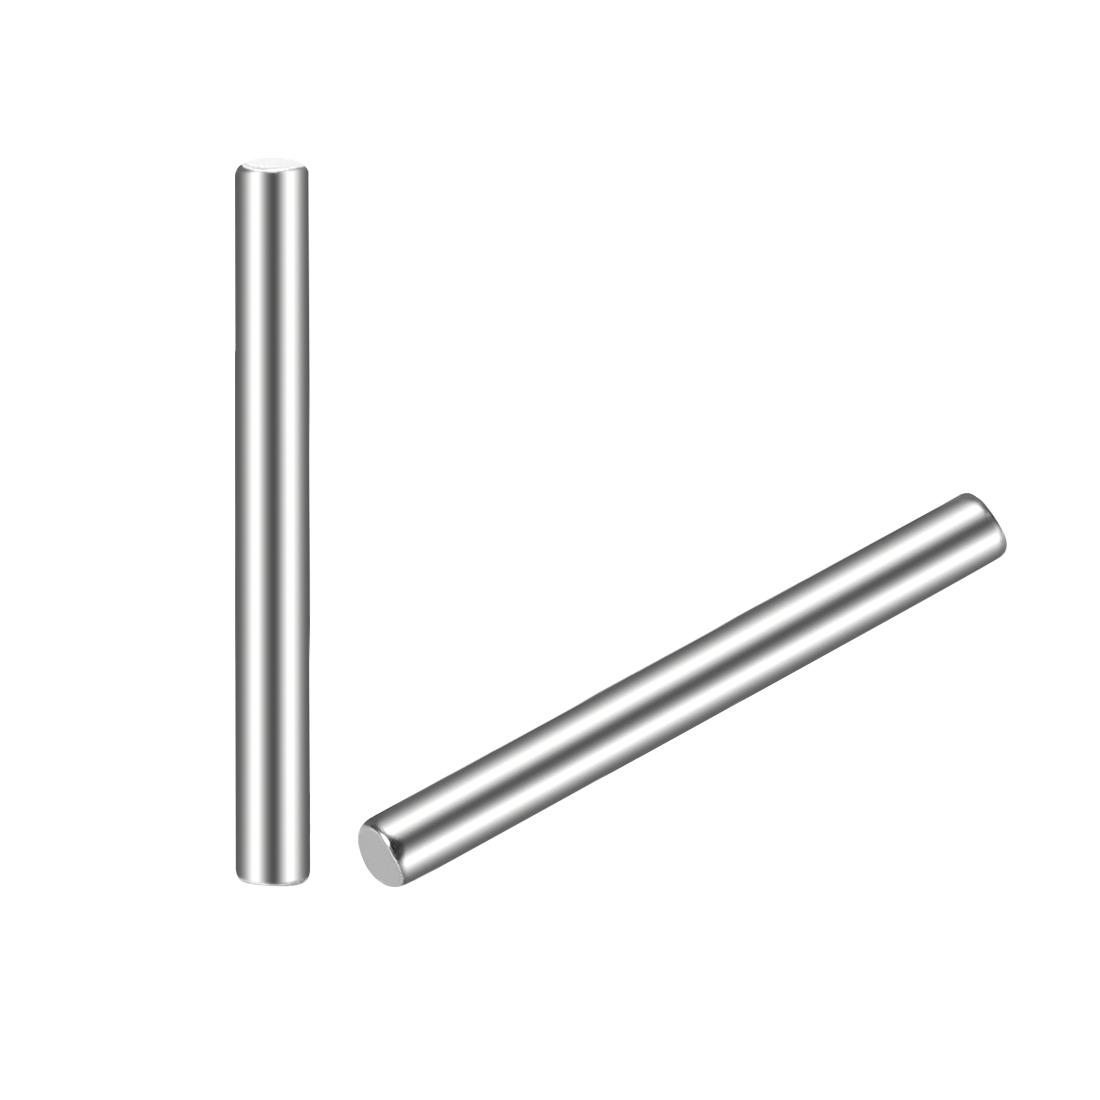 15Pcs 2mm x 20mm Dowel Pin 304 Stainless Steel Shelf Support Pin Fasten